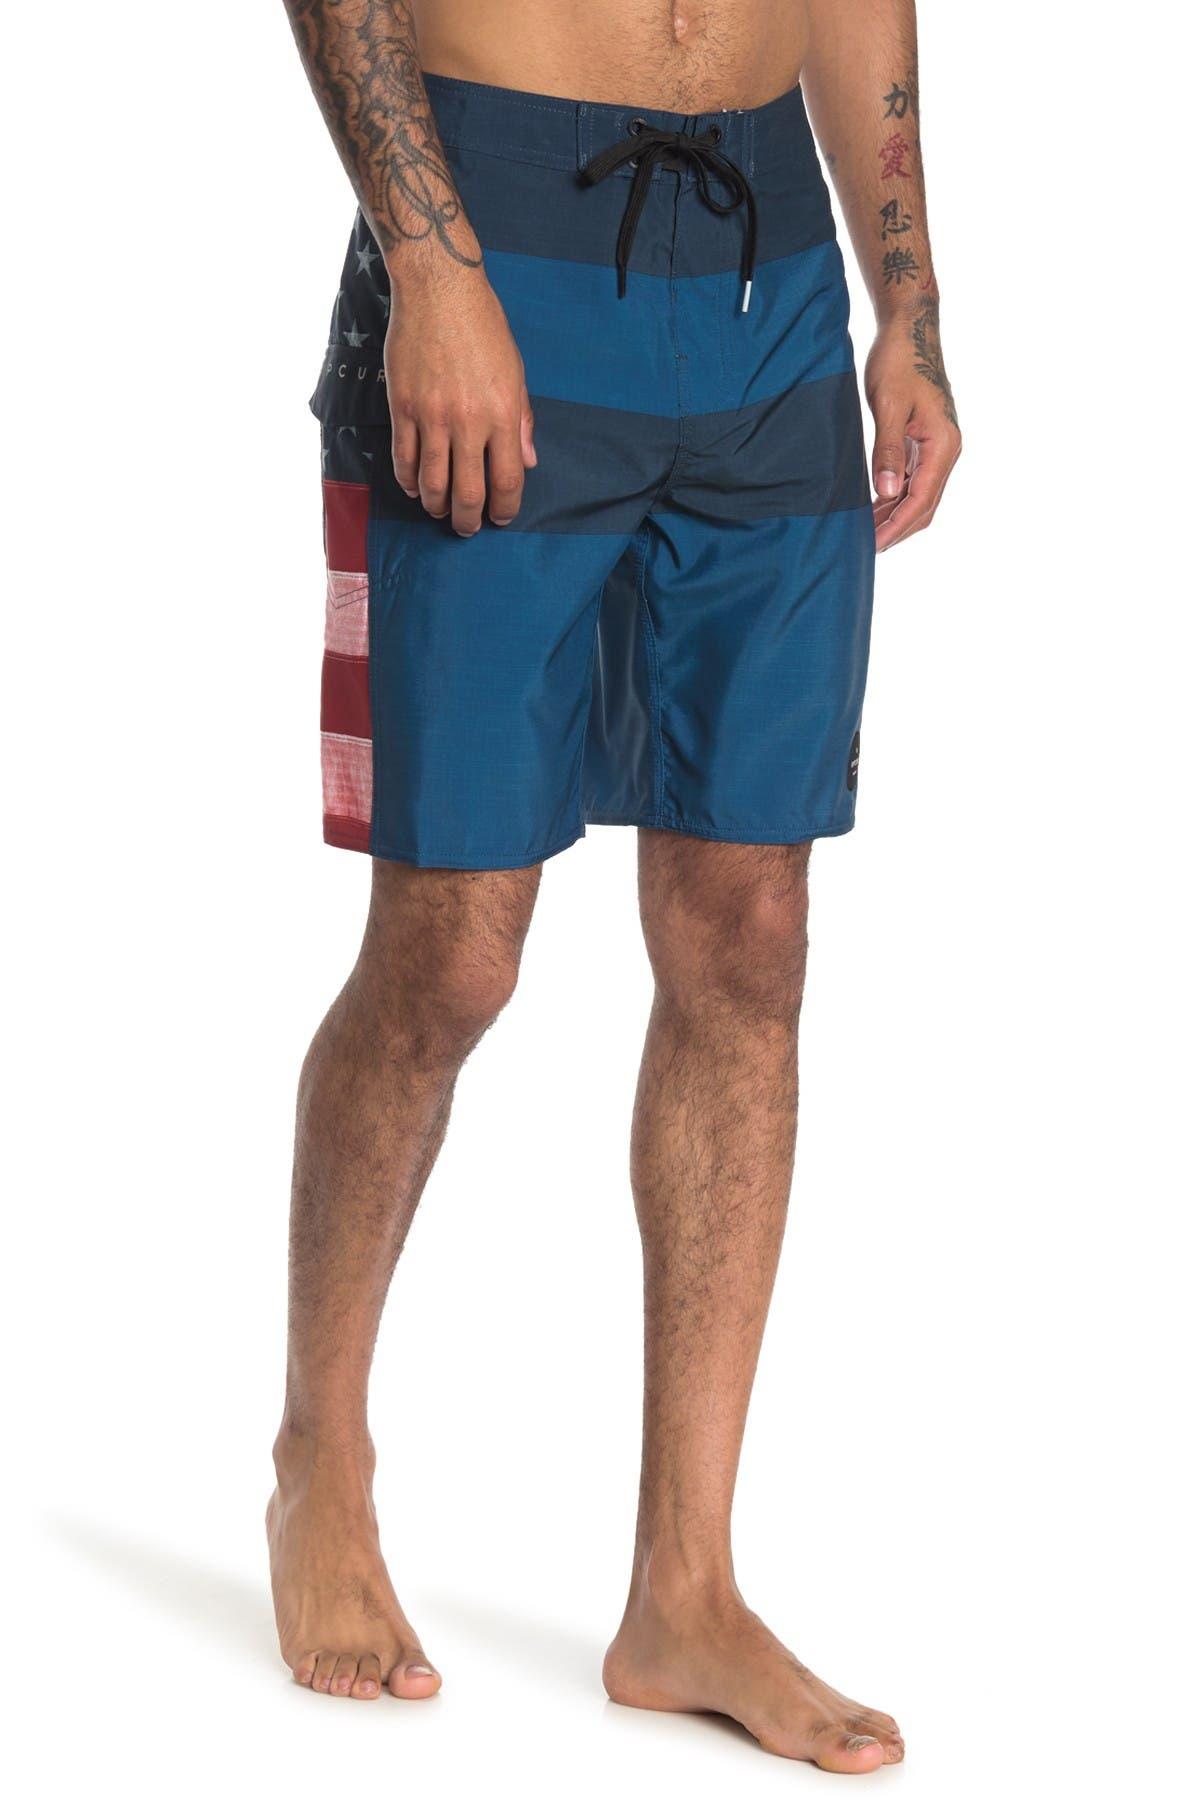 Image of Rip Curl Stateside Boardshorts